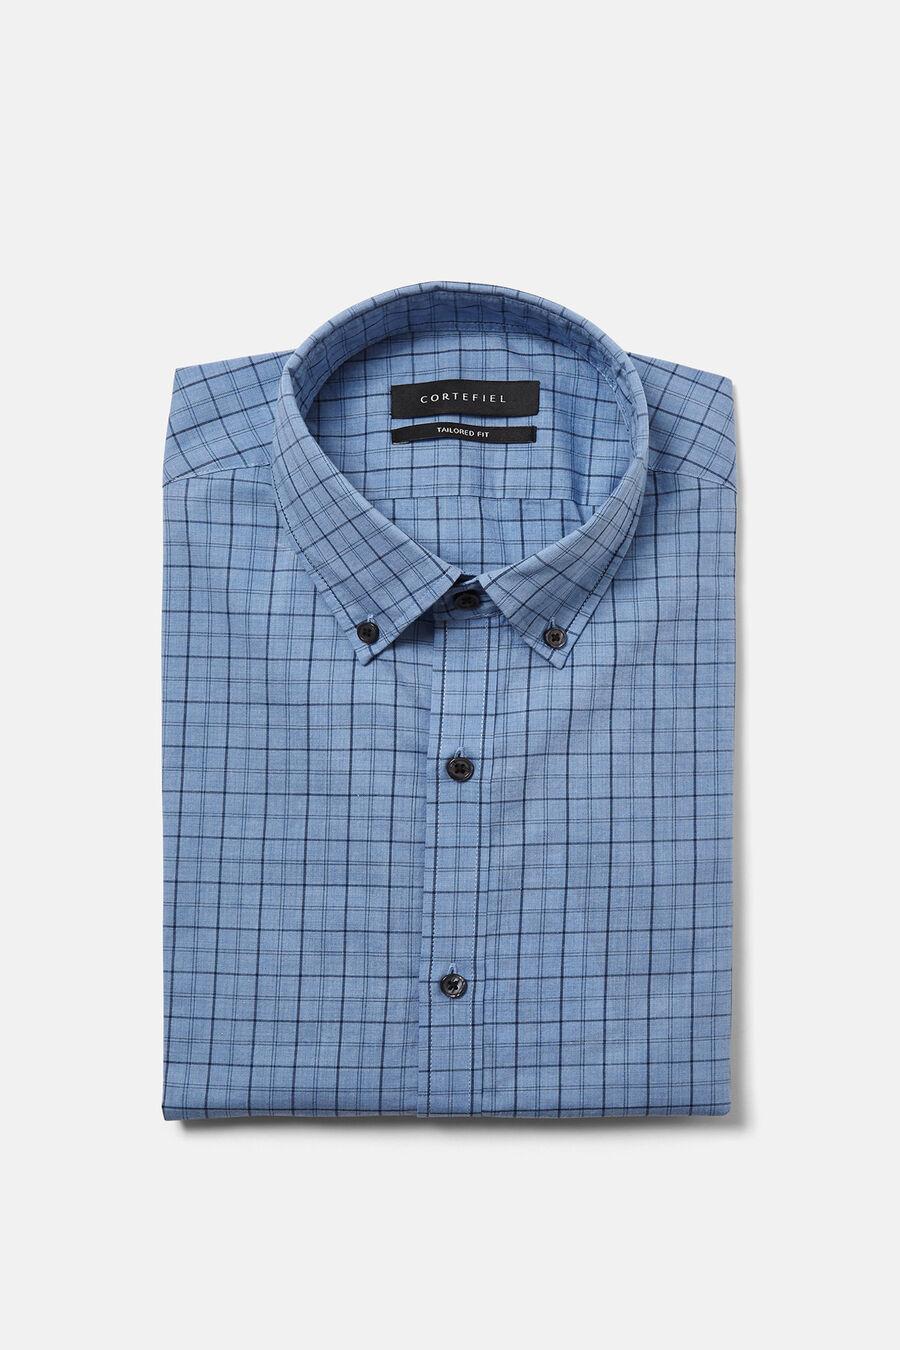 Window check shirt